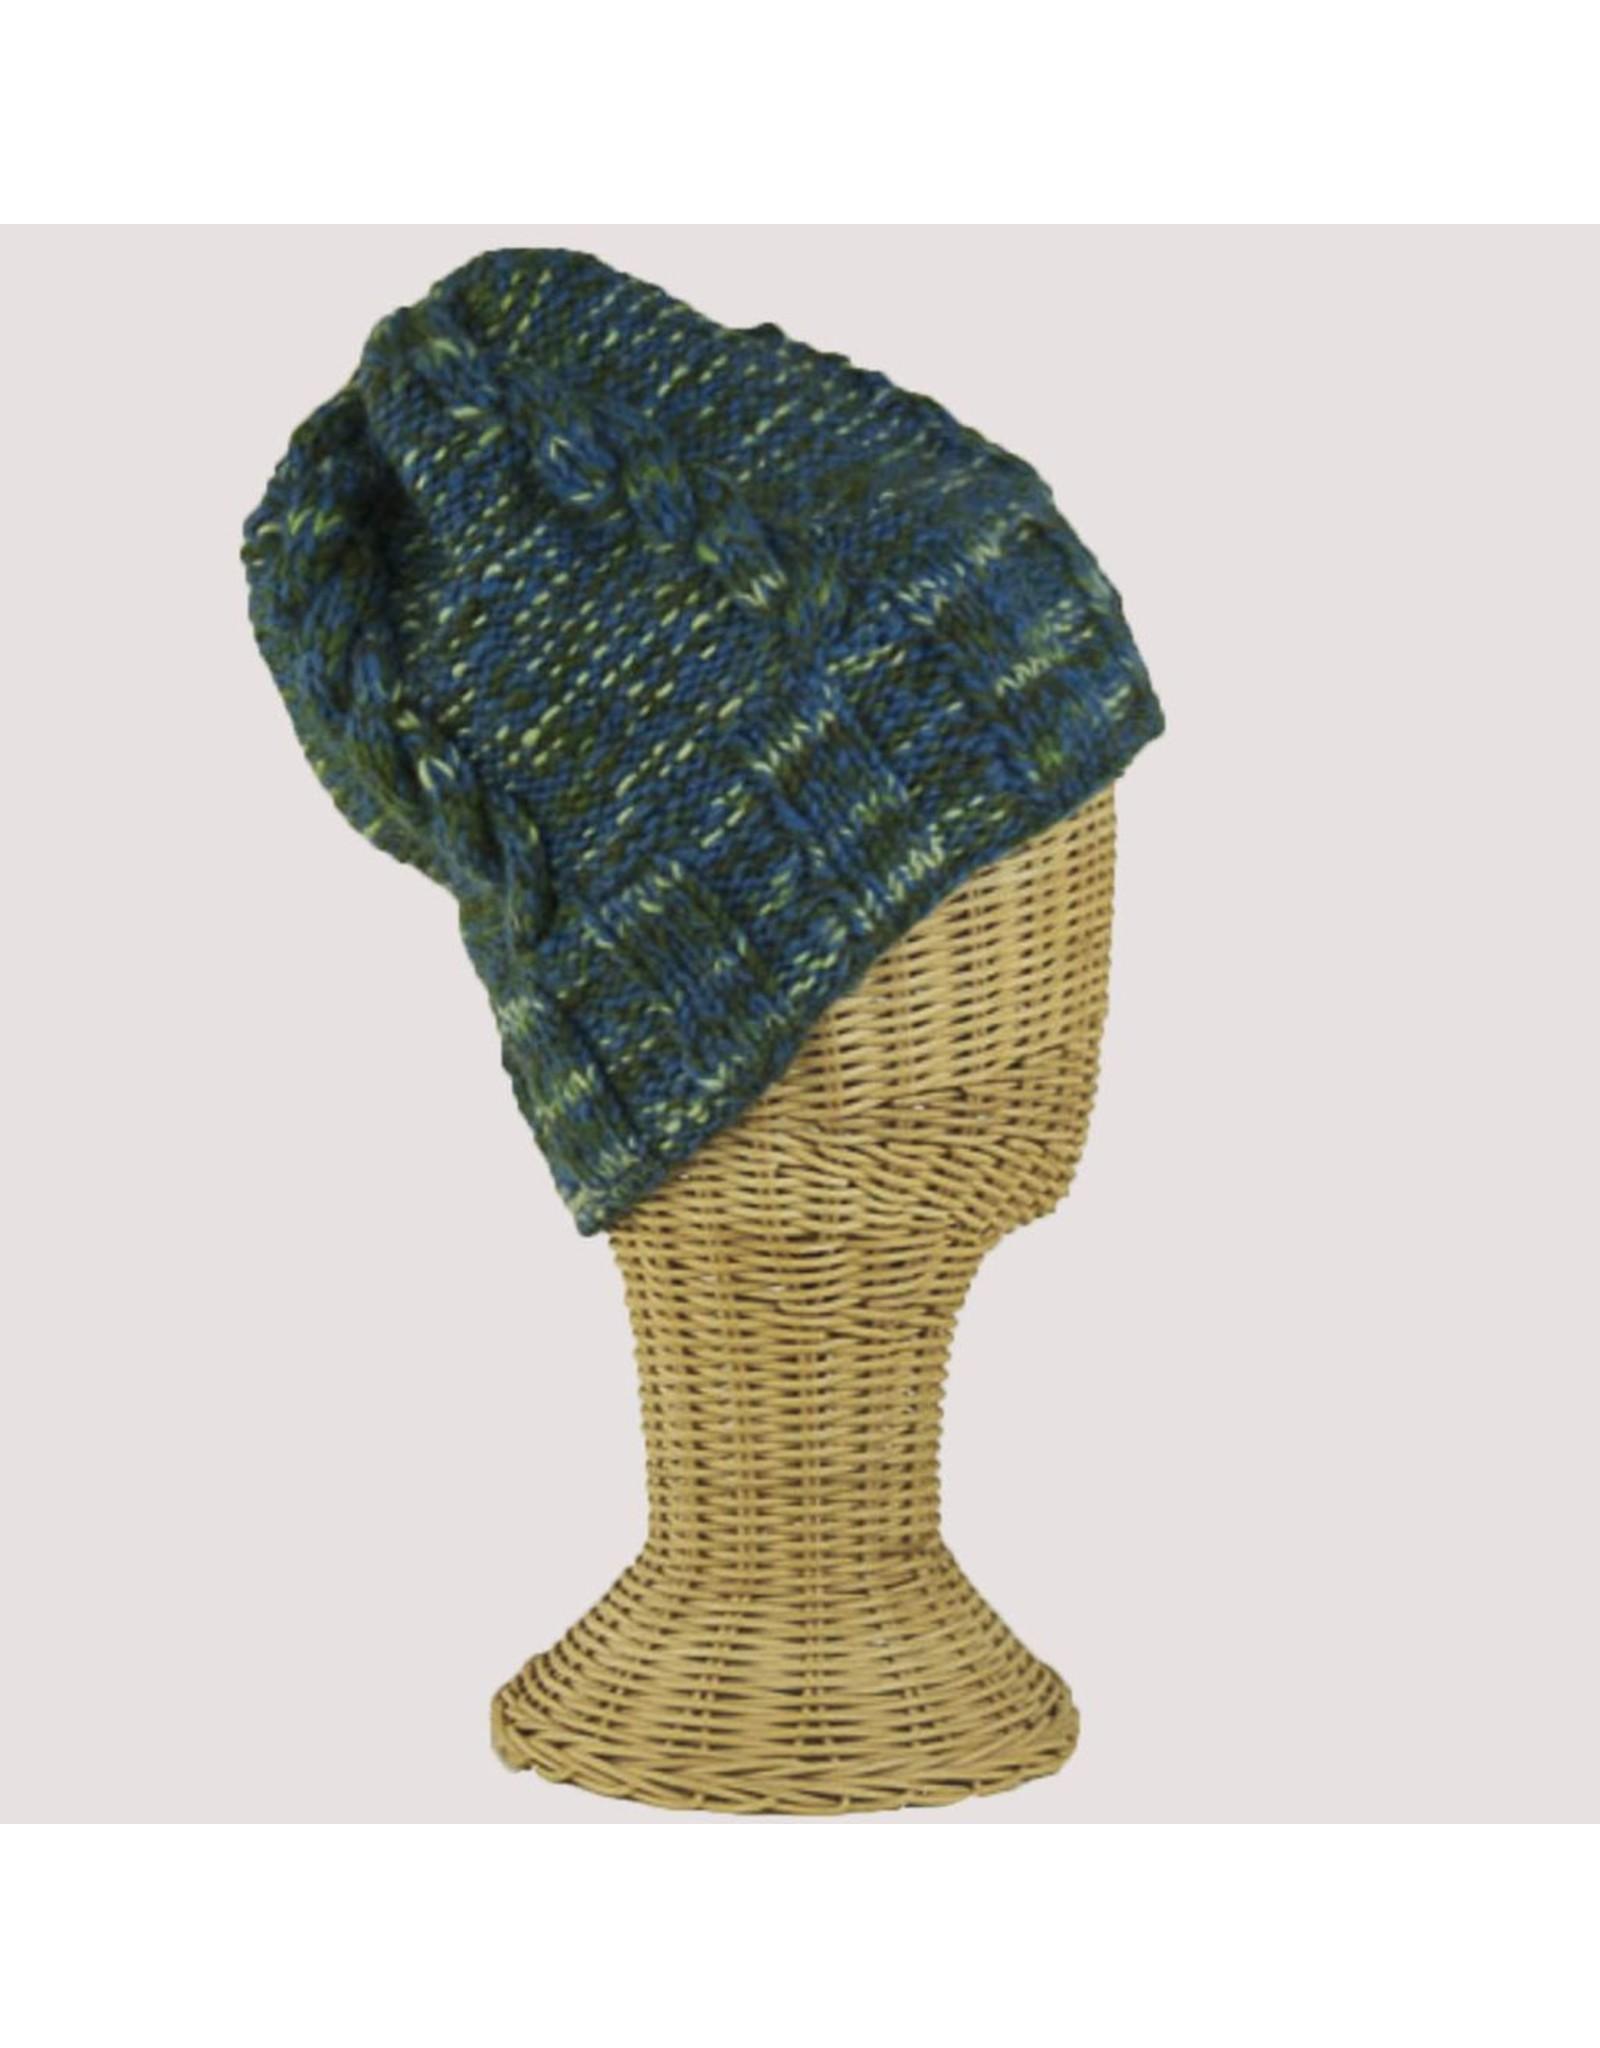 The Sweater Venture Snowfox Fleece Lined Alpine Cap